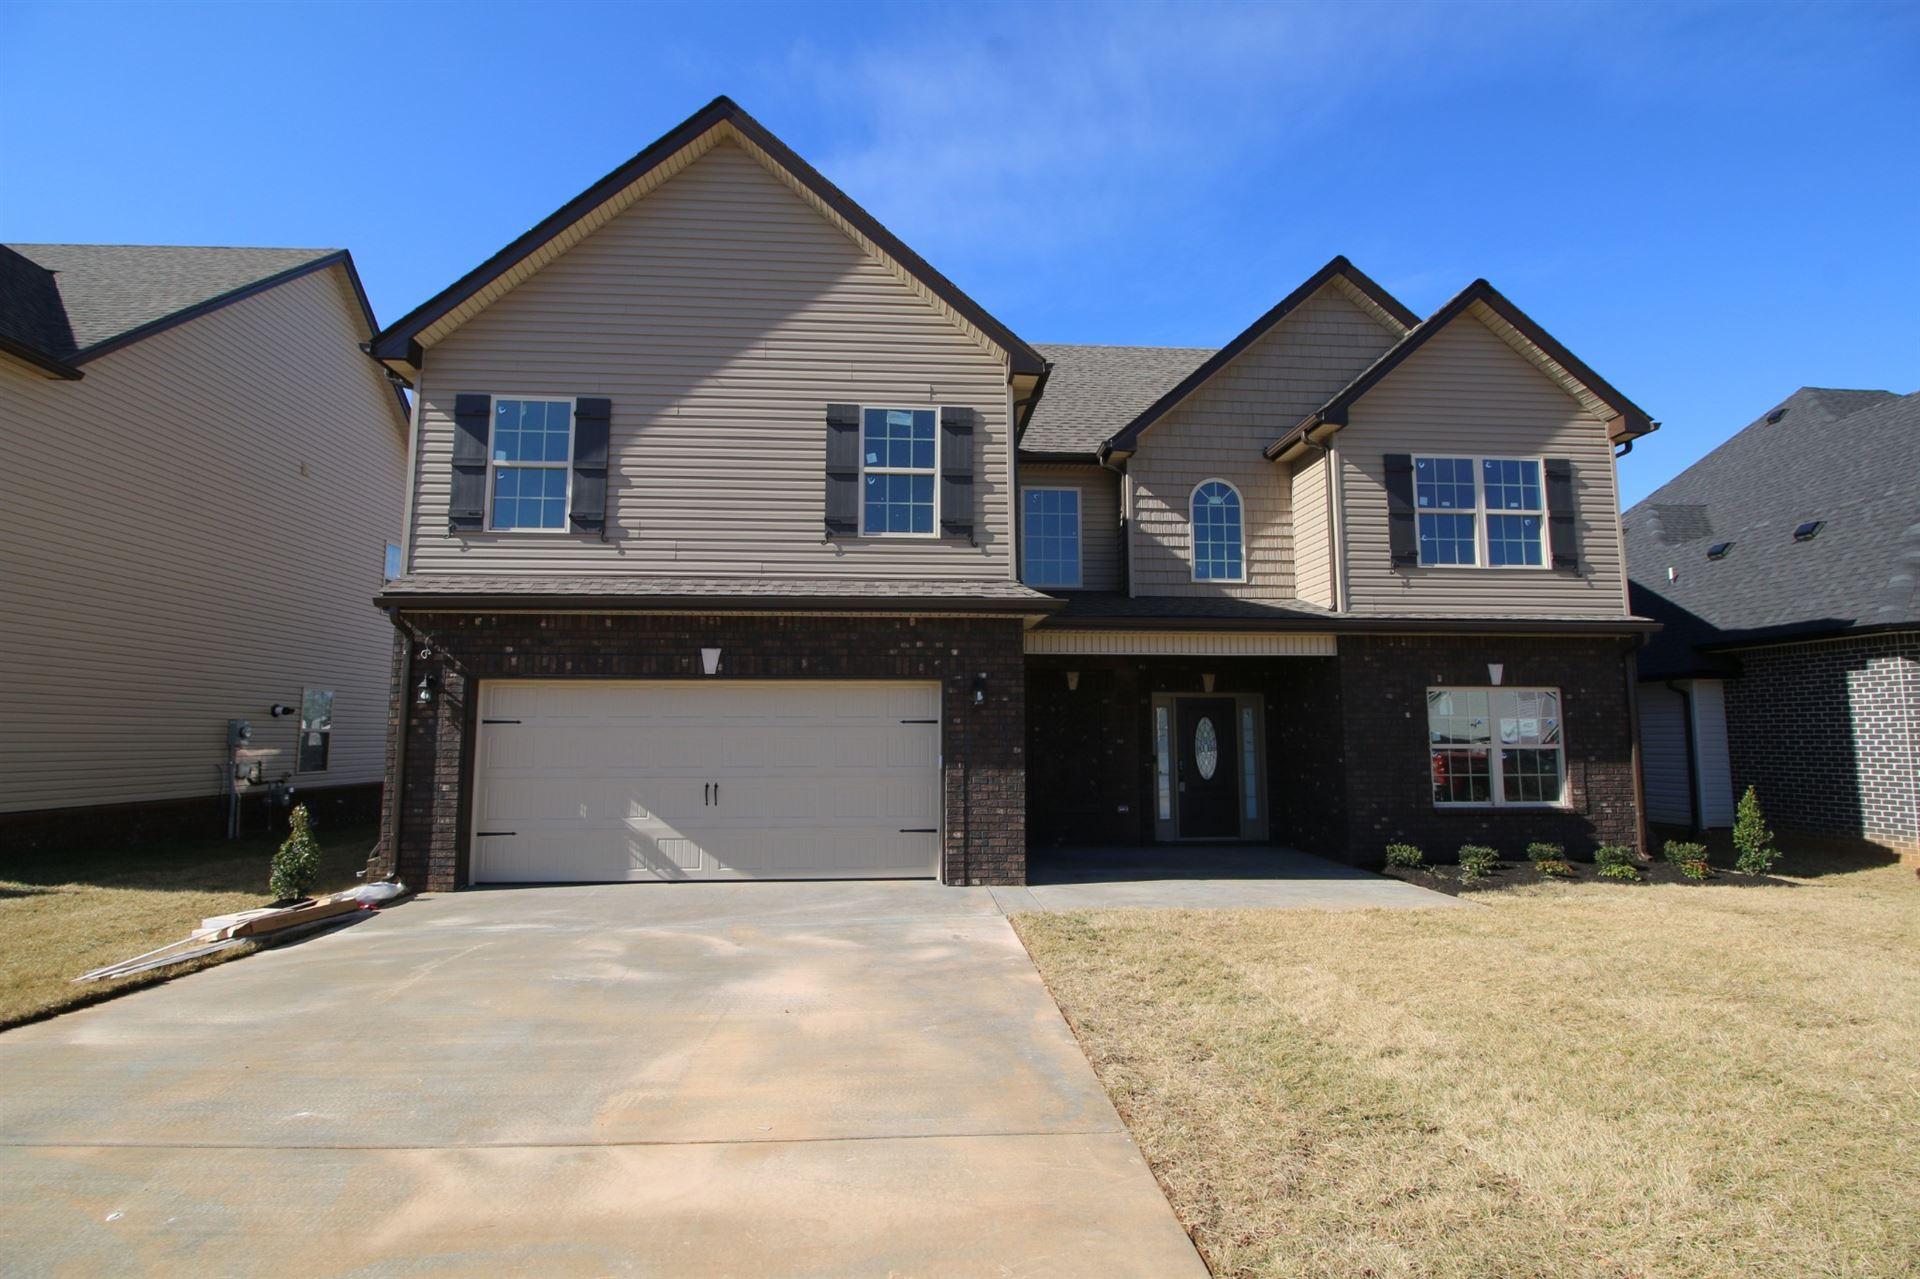 407 Summerfield, Clarksville, TN 37040 - MLS#: 2299369